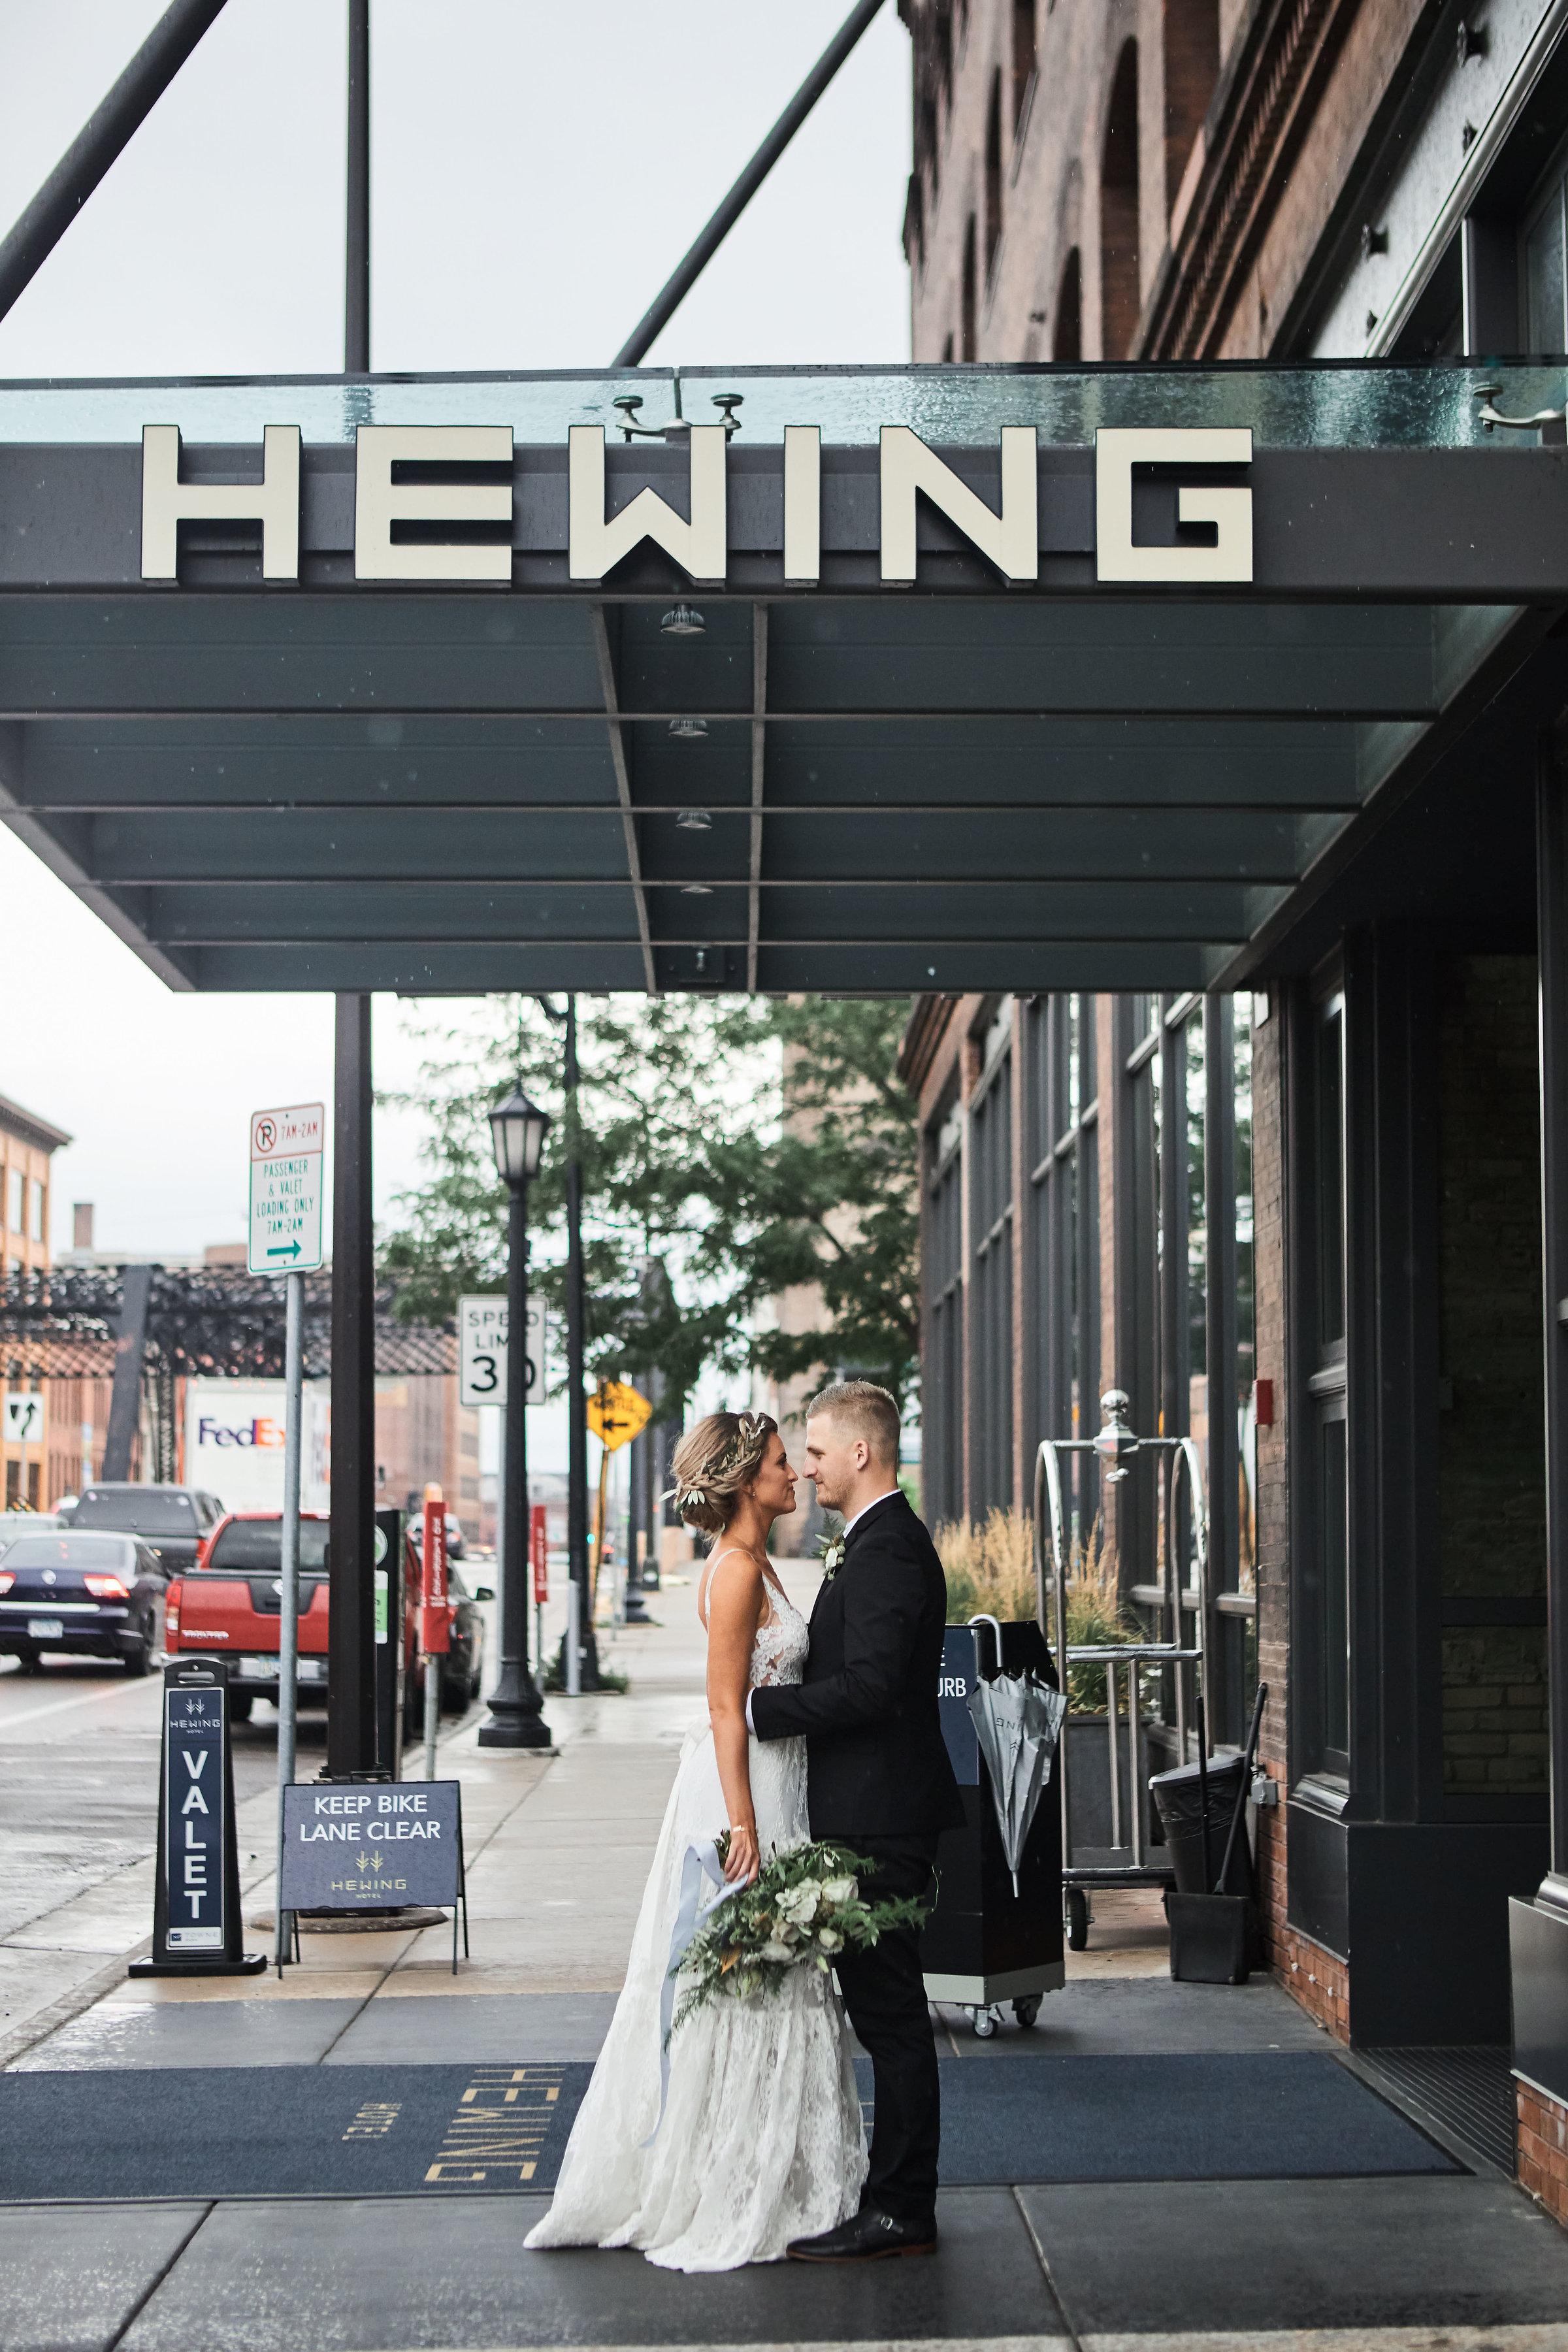 Hewing hotel wedding